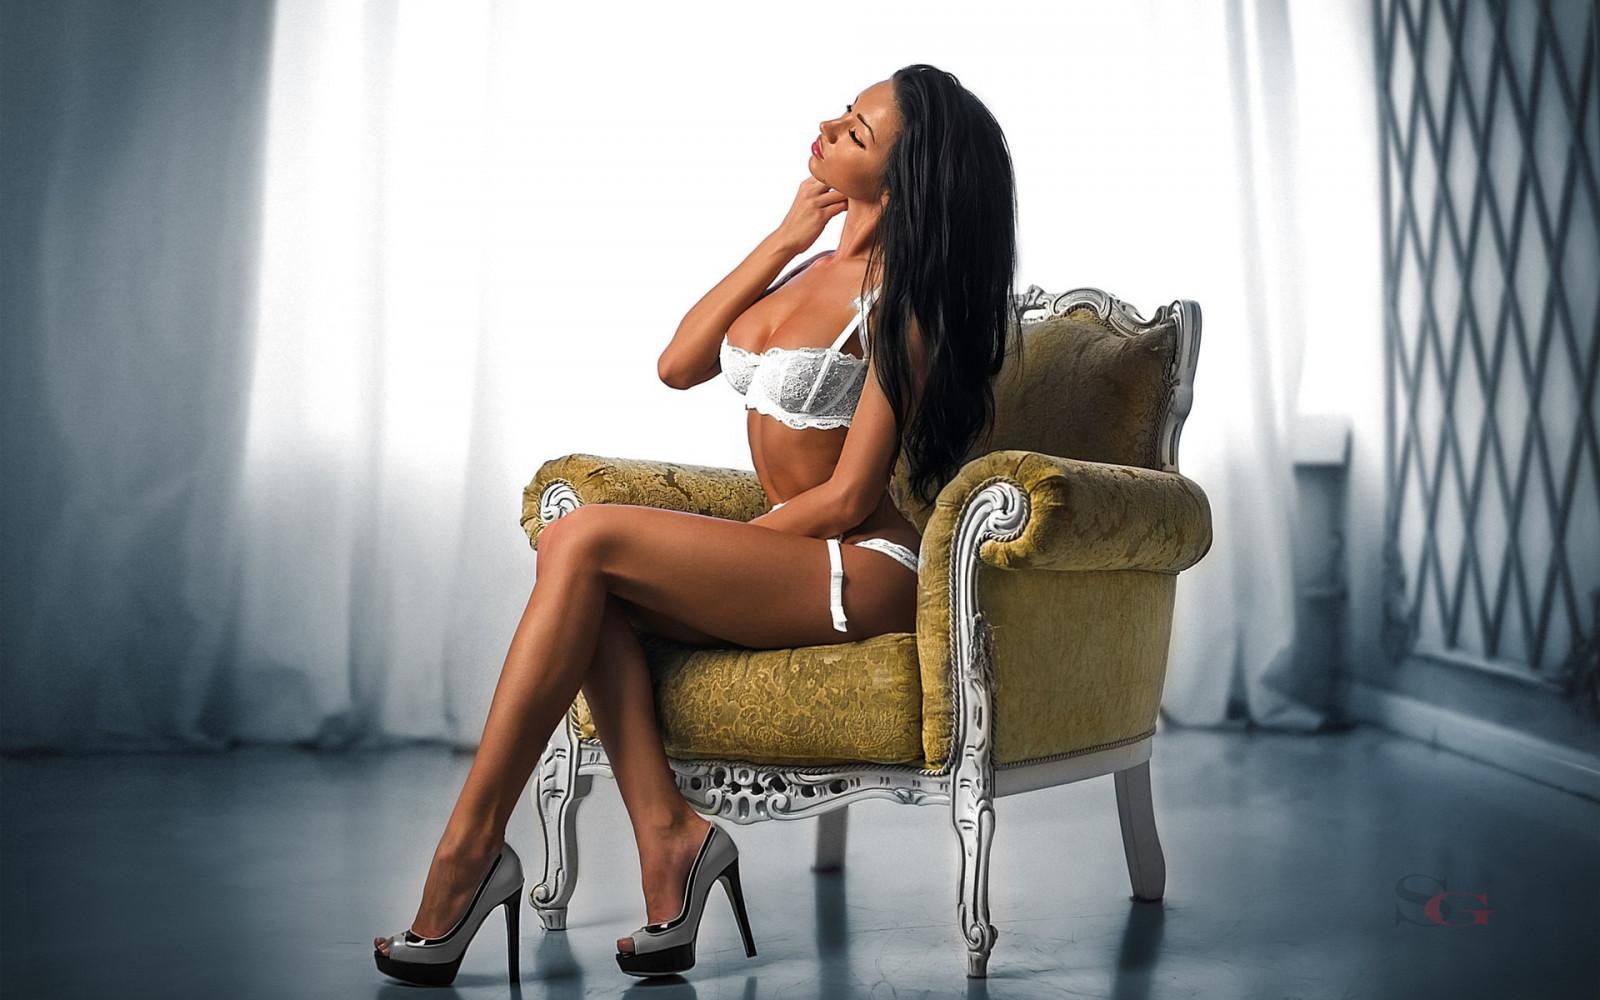 Wallpaper  Women, Long Hair, Closed Eyes, Brunette, Legs, Sitting, High Heels -8402